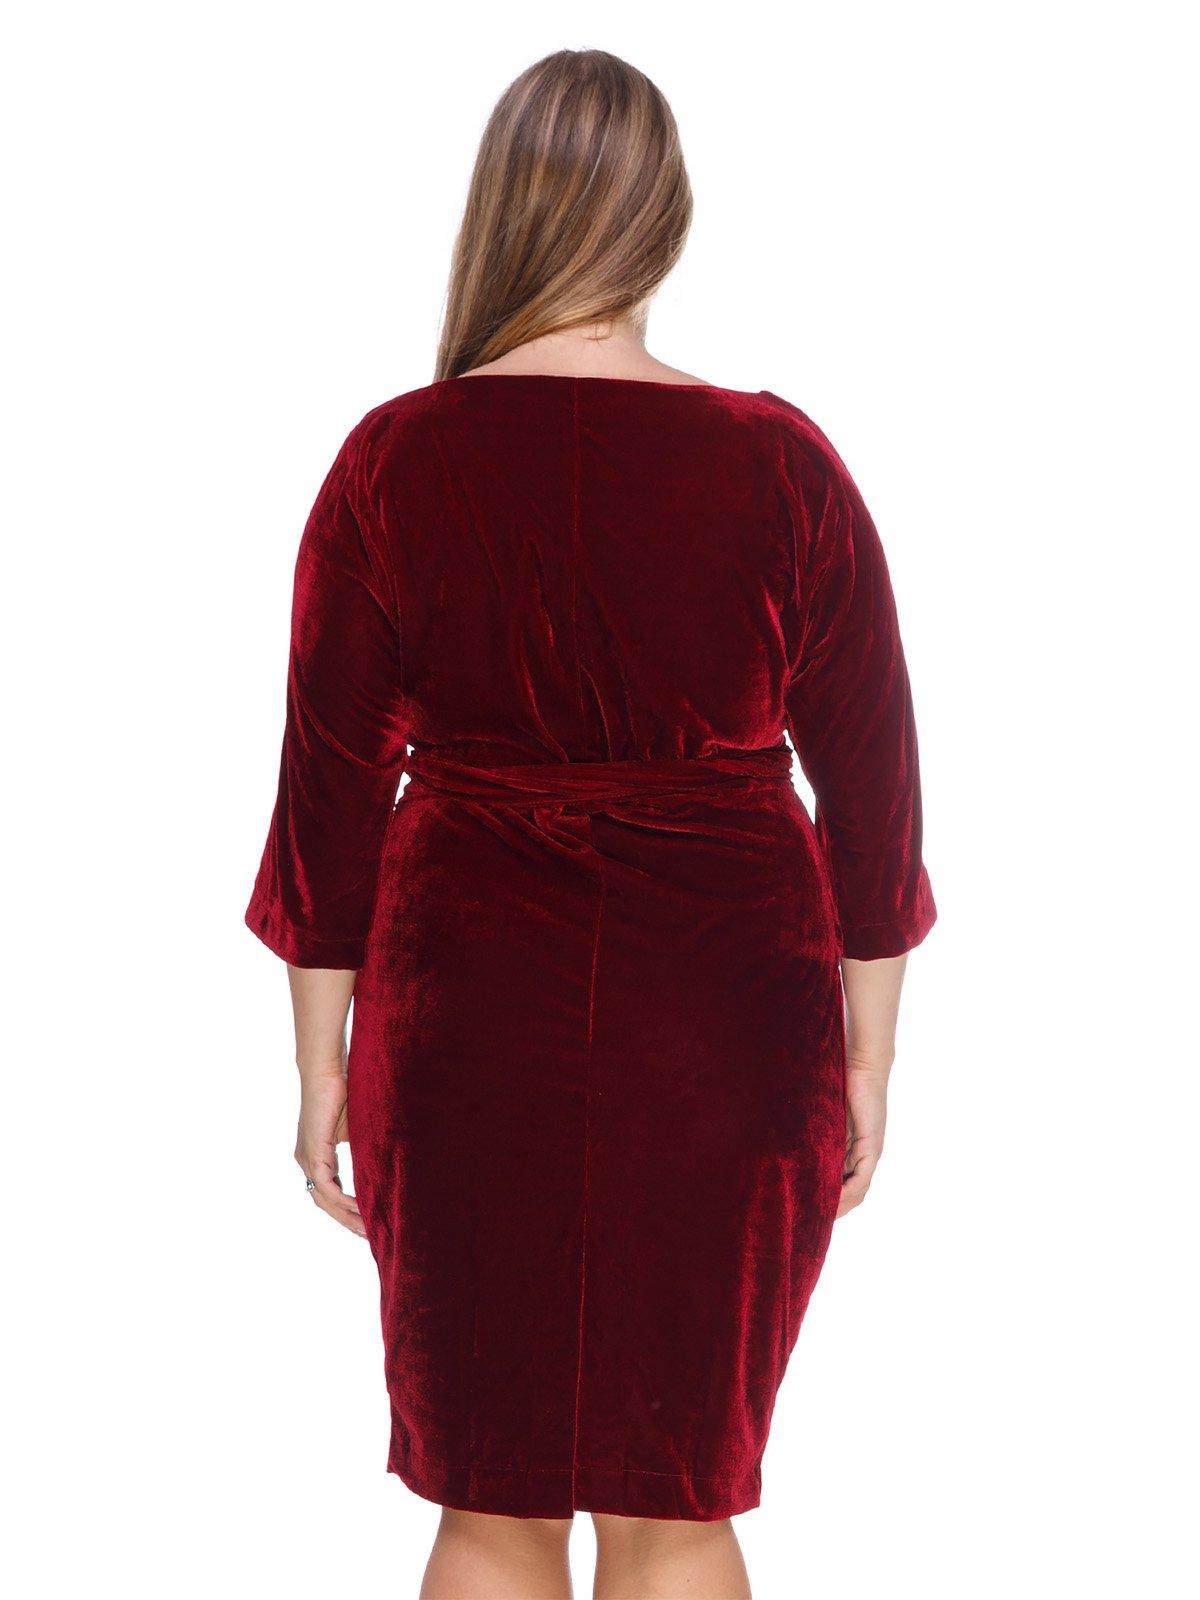 36857f2f7e4 Платье бархатное красное — Marc Vero Maxxi